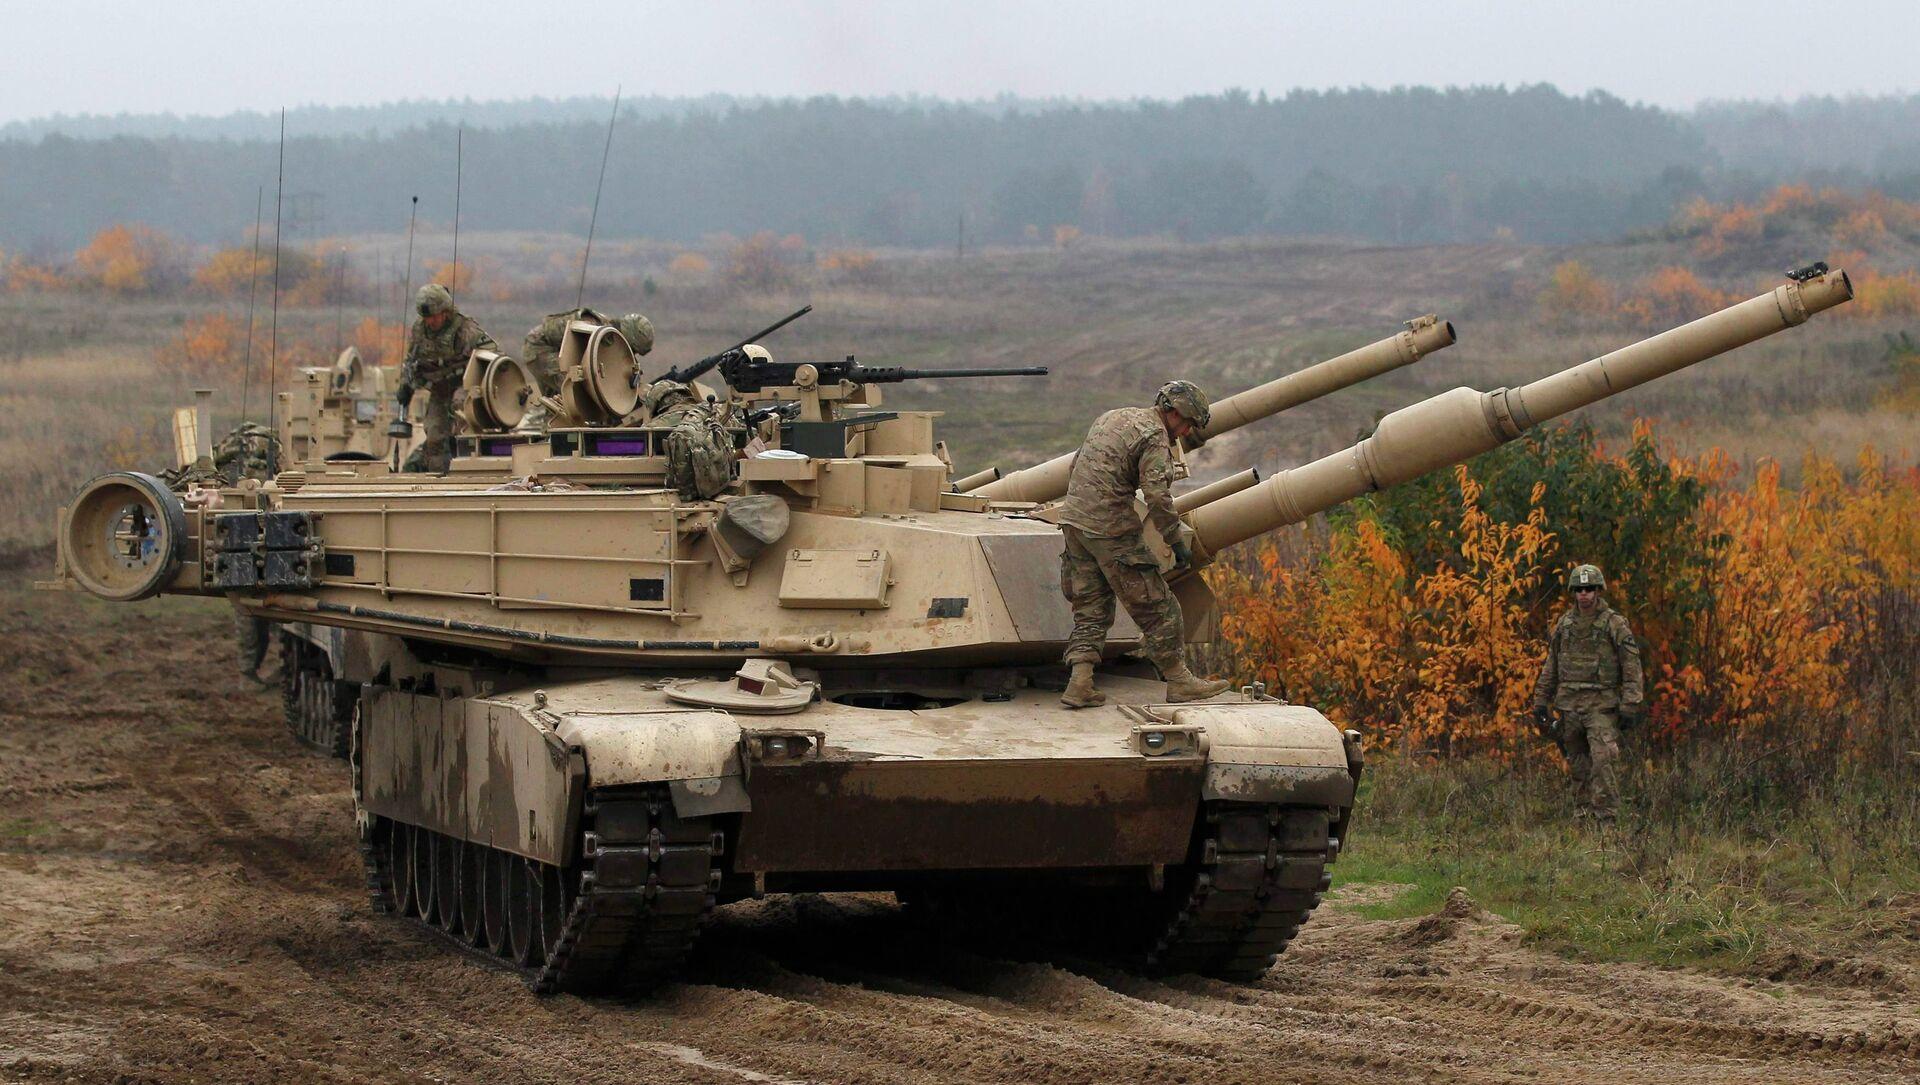 Tanks américains Abrams - Sputnik France, 1920, 16.07.2021